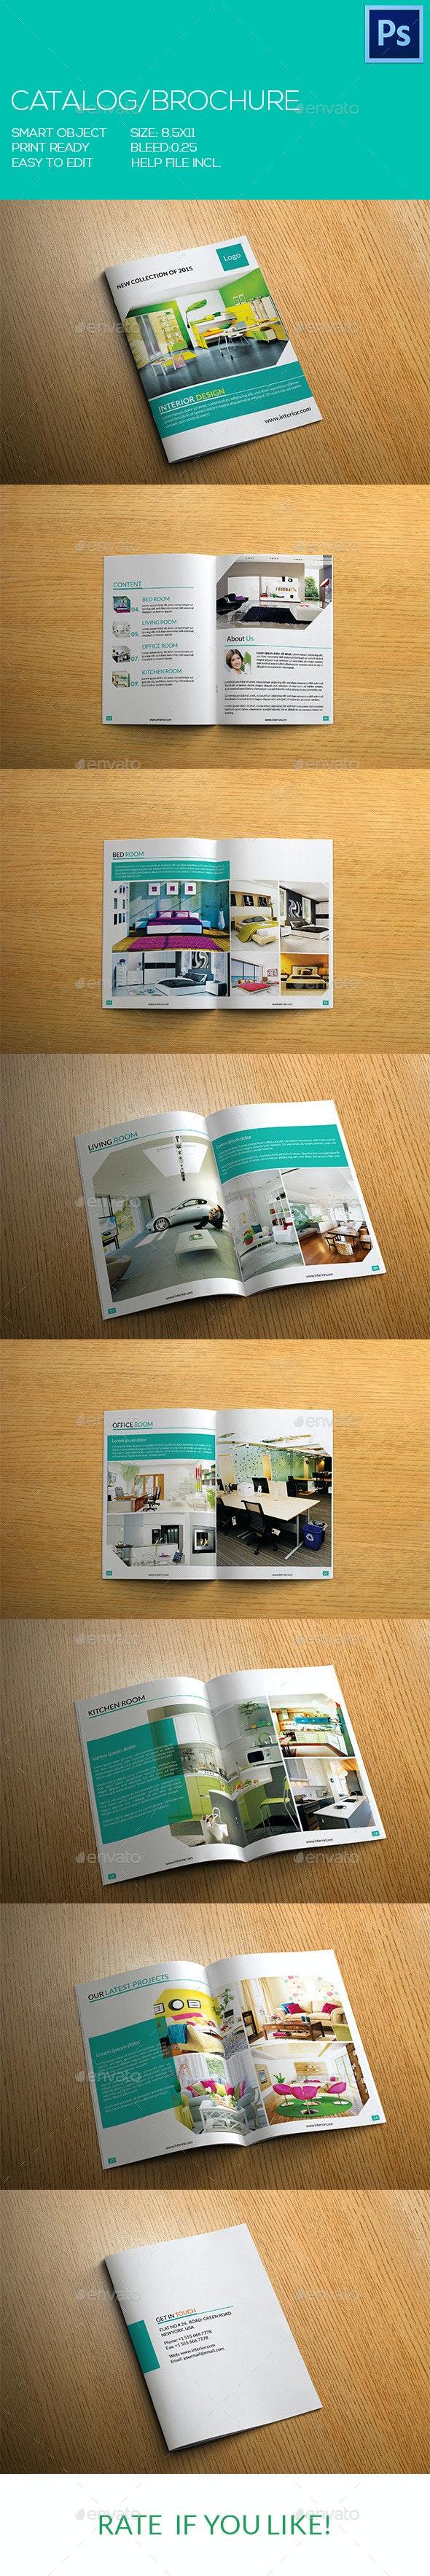 Catalog/Brochure - Catalogs Brochures